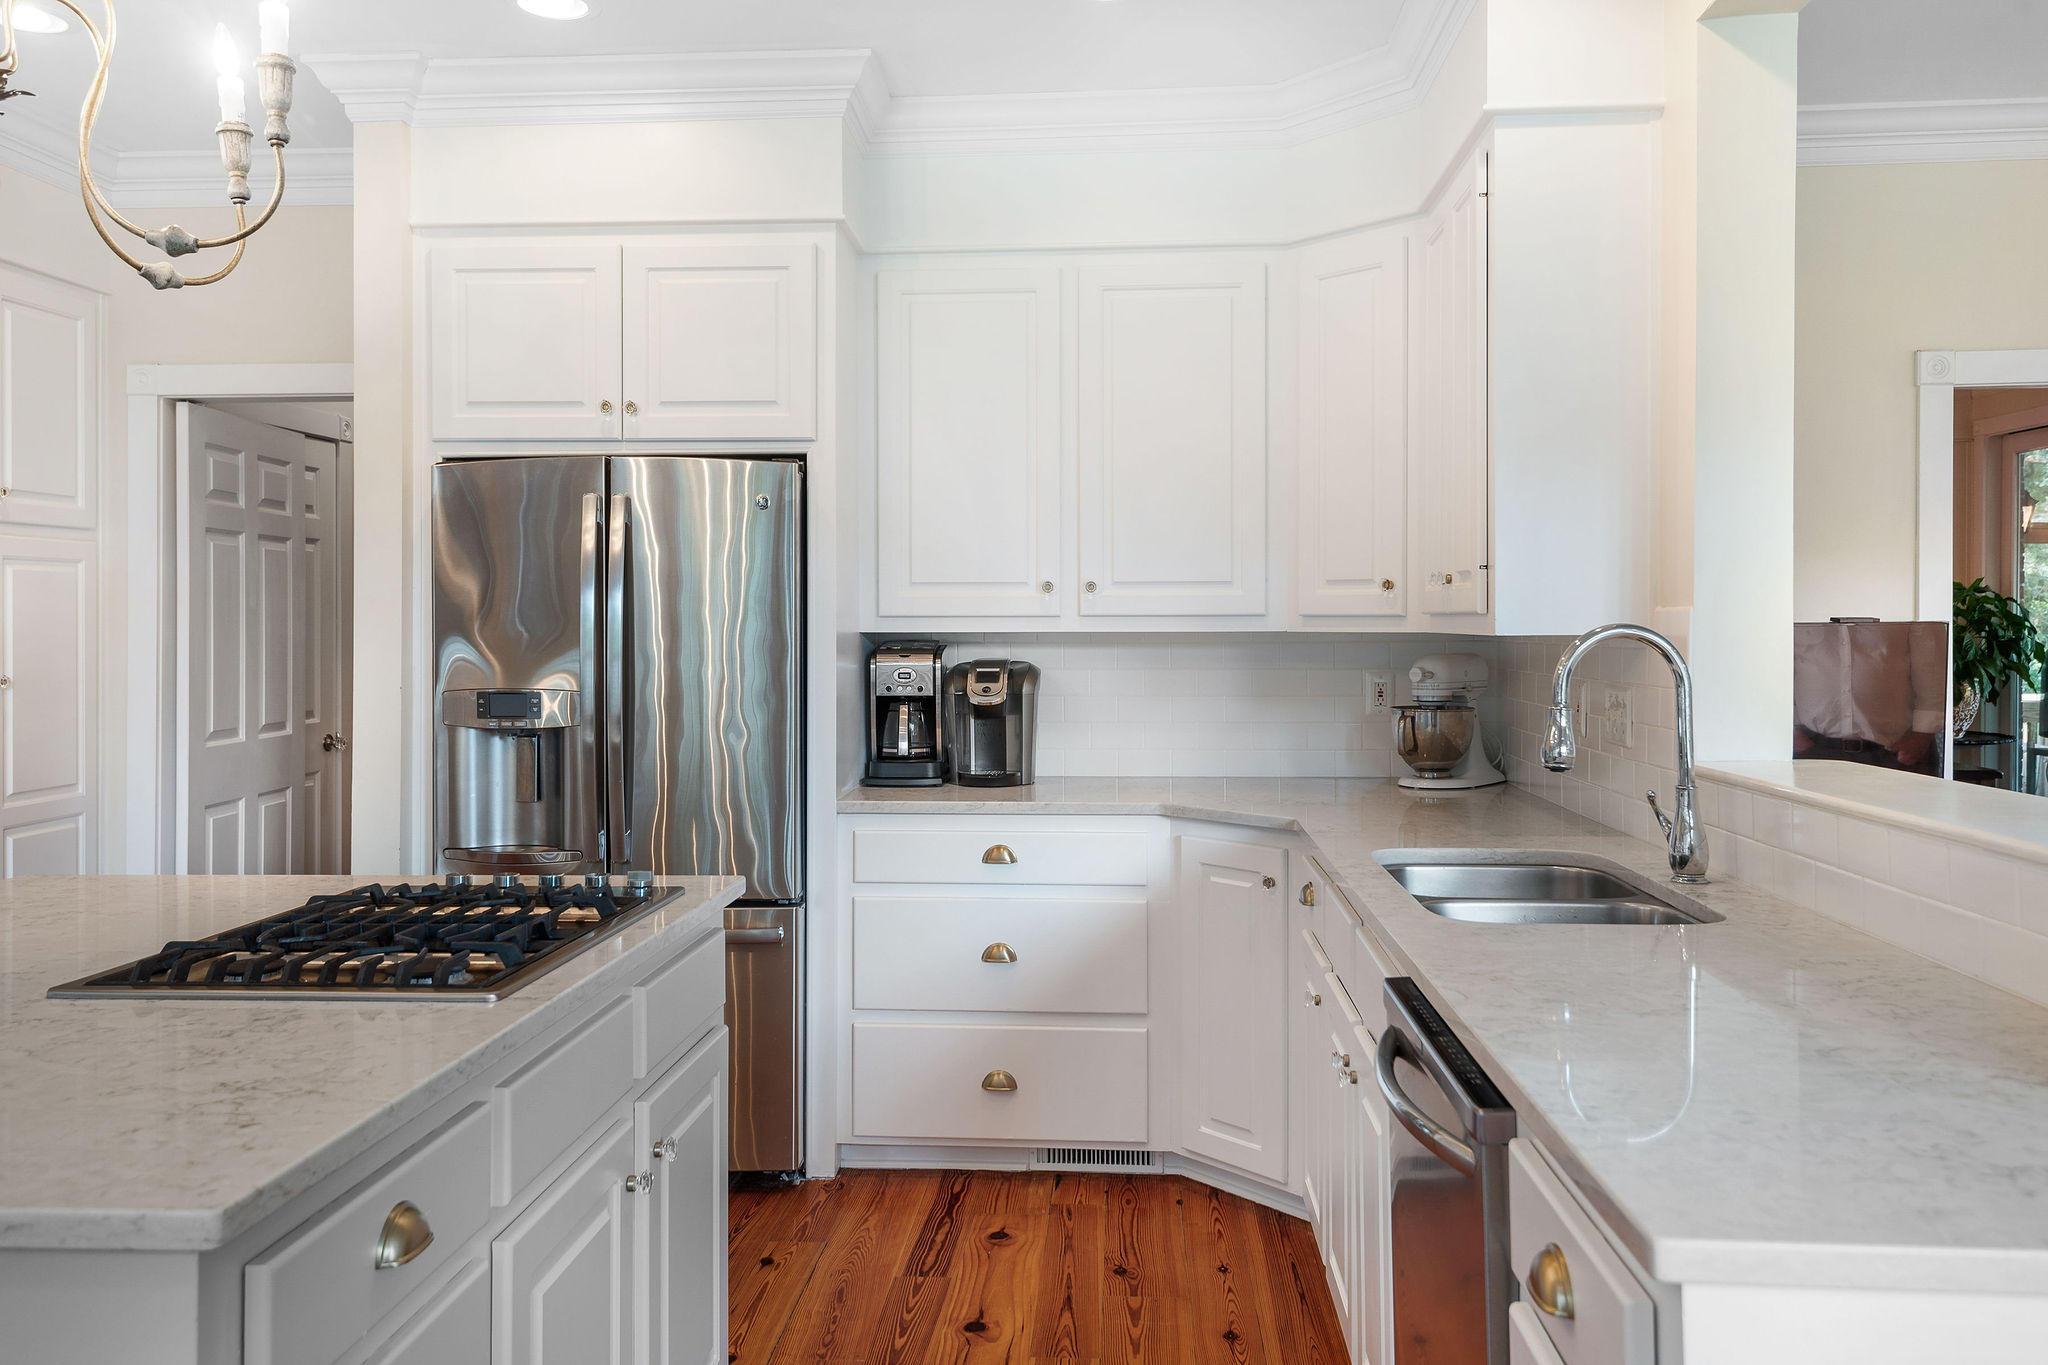 Country Club II Homes For Sale - 1482 Burningtree, Charleston, SC - 50